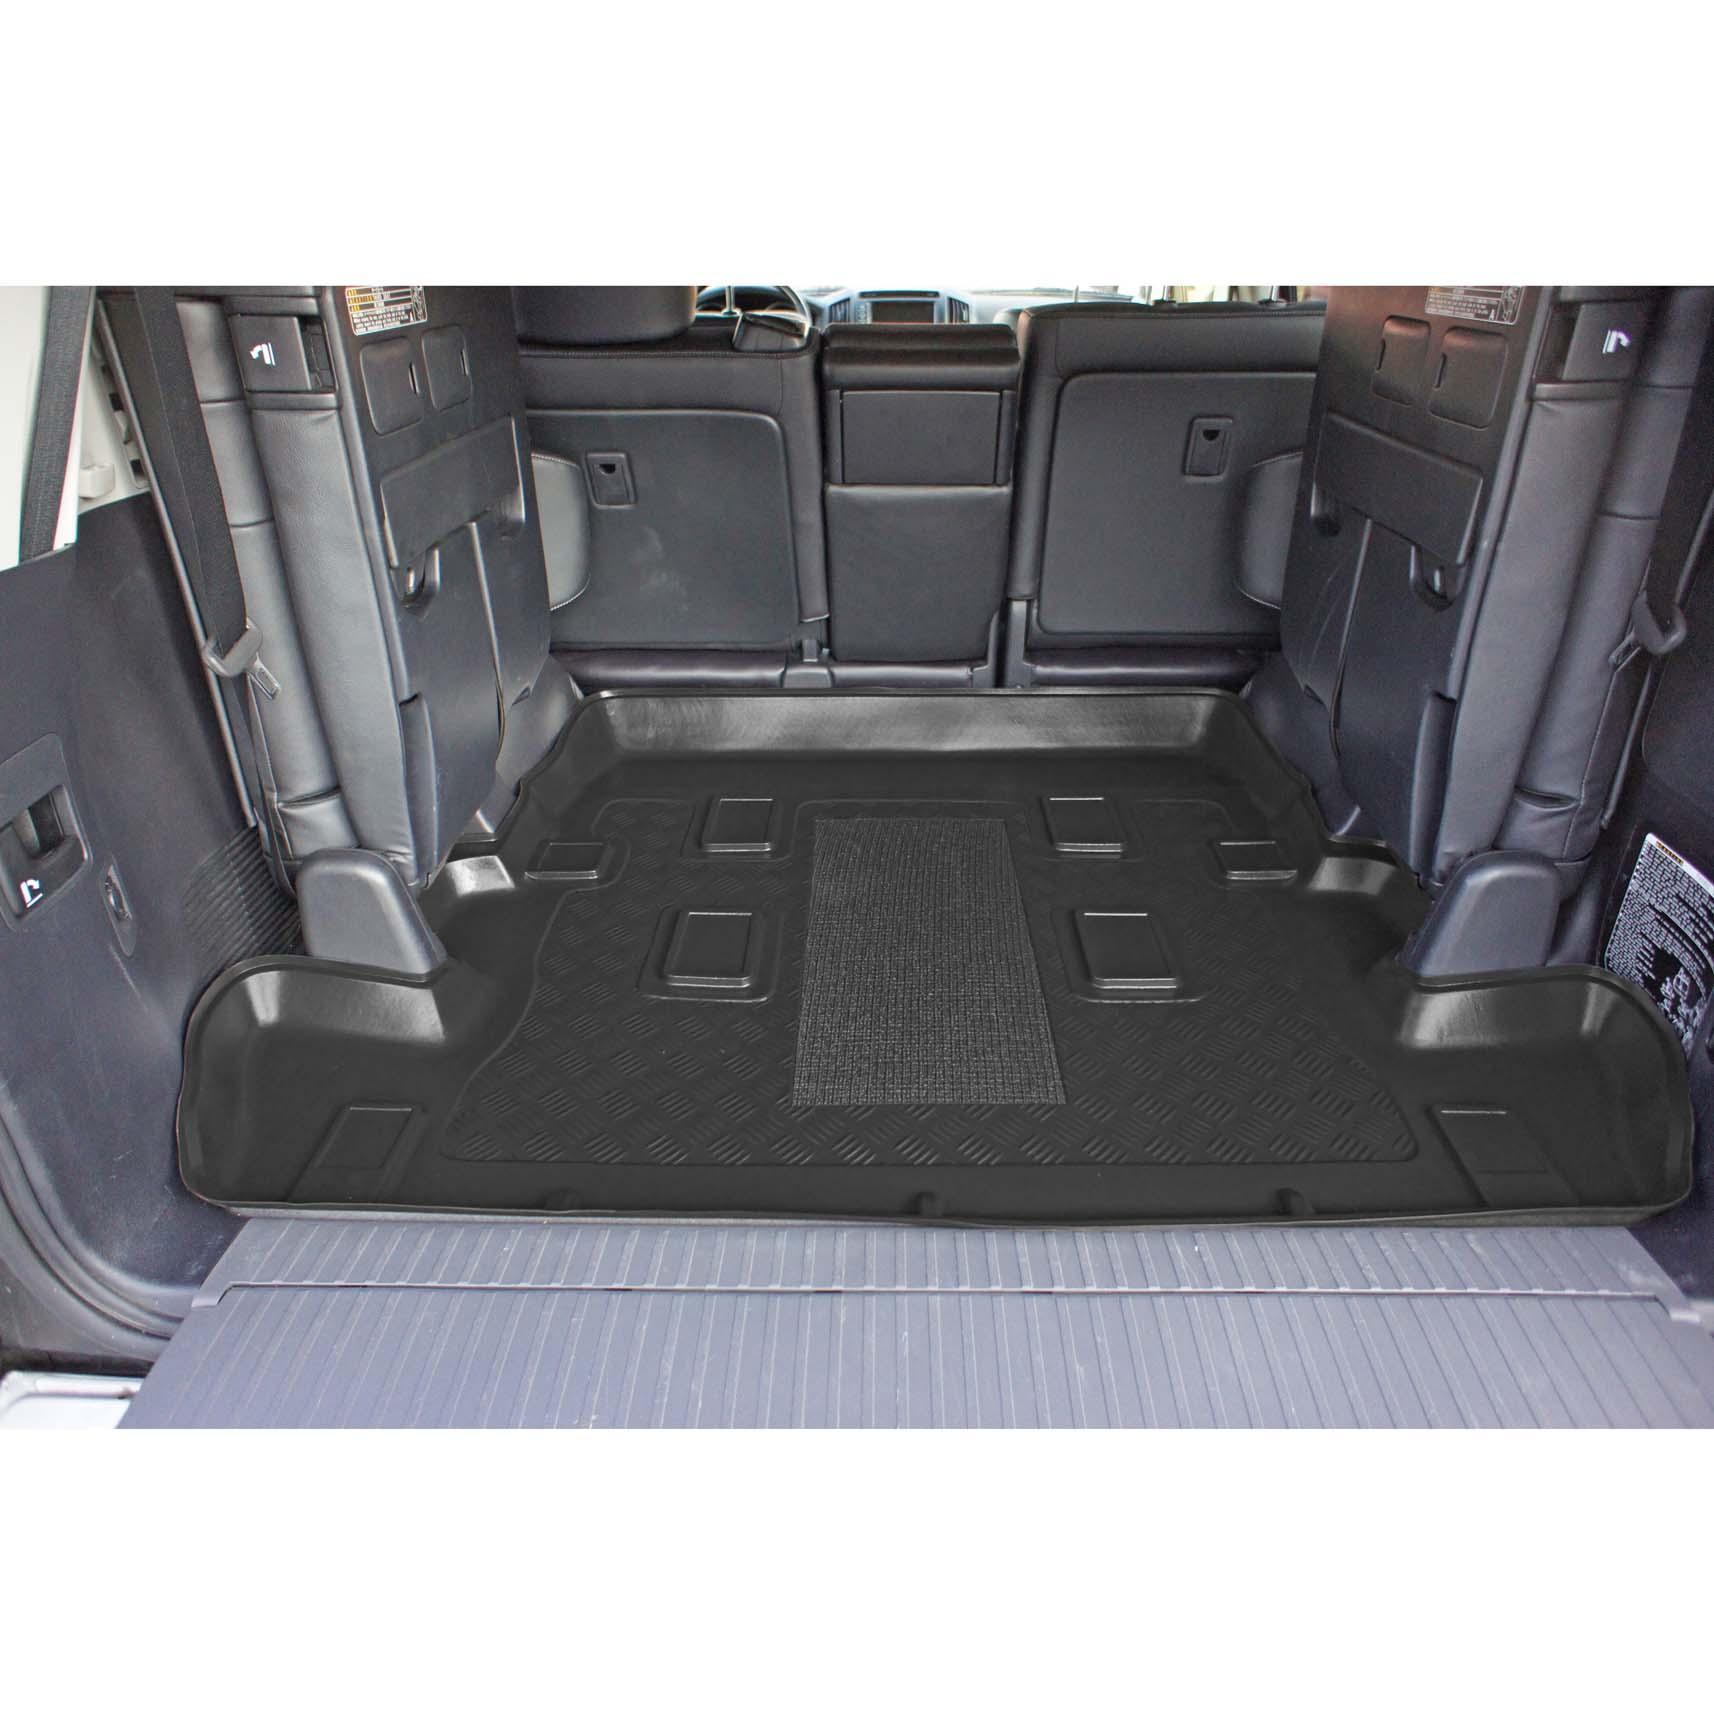 Toyota Yaris III htb/3/5 11R dolní kufr